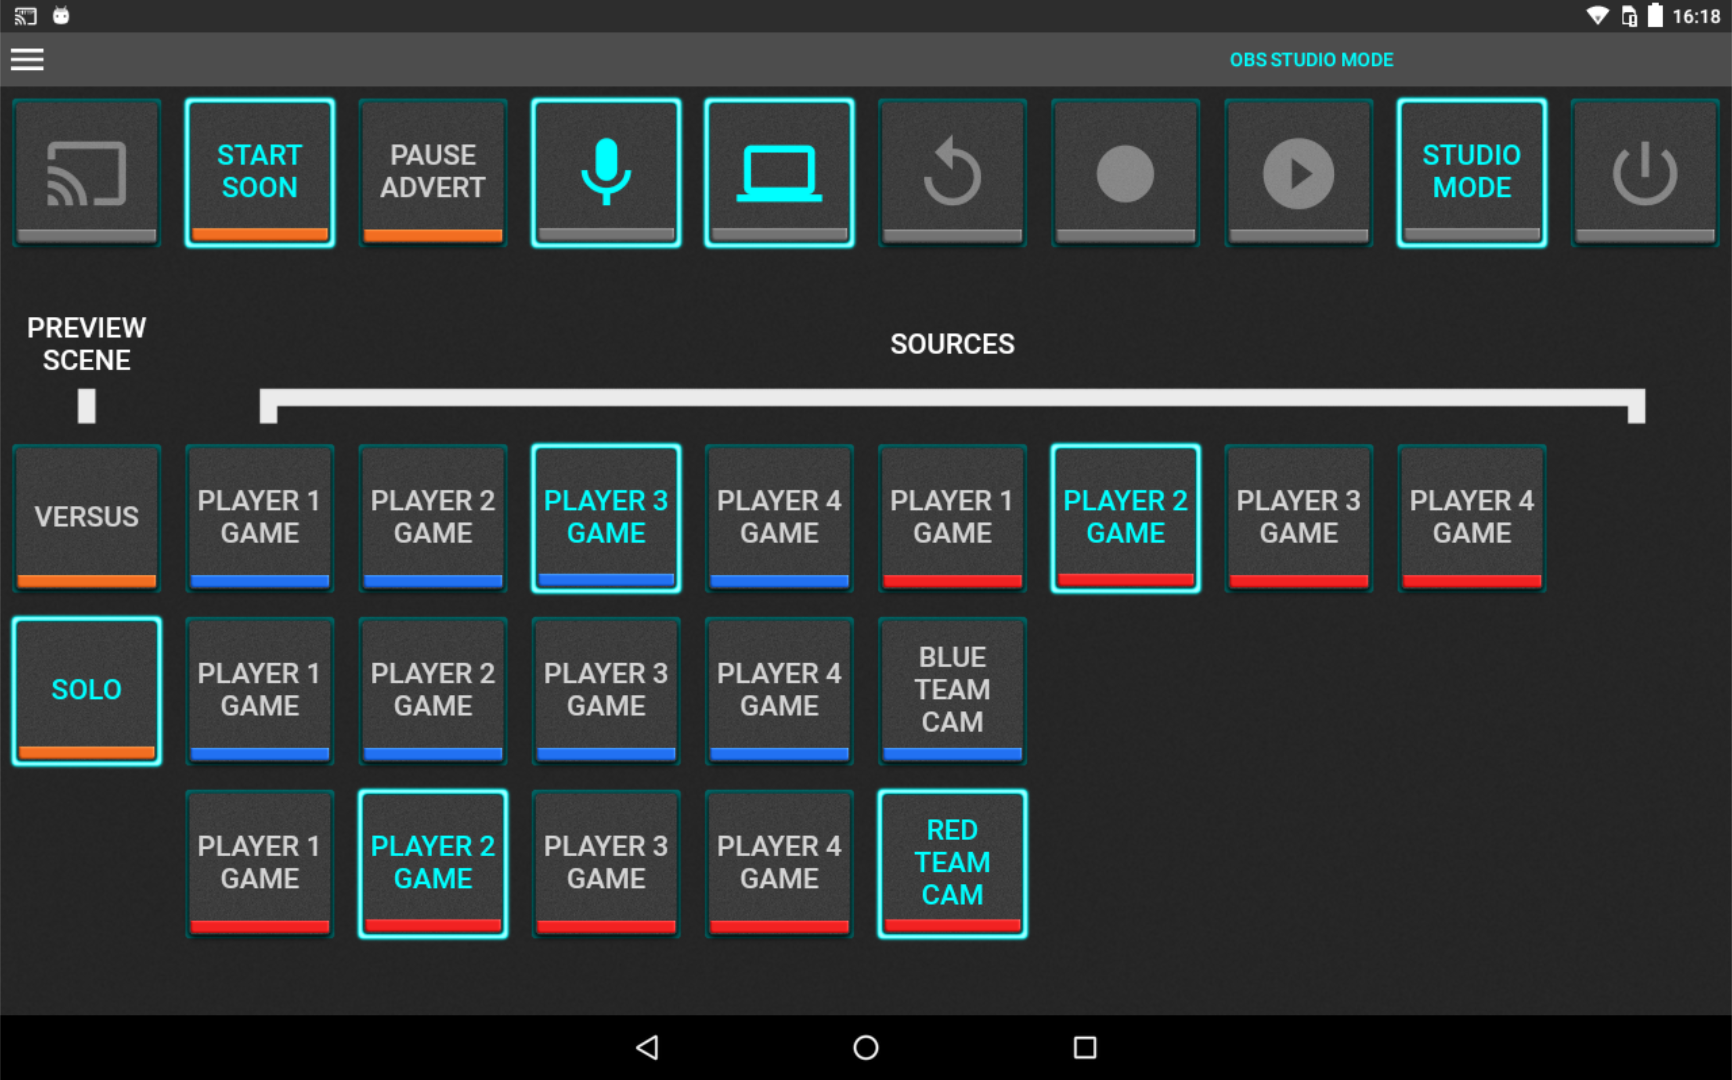 obs-studio-mode-screenshot.png